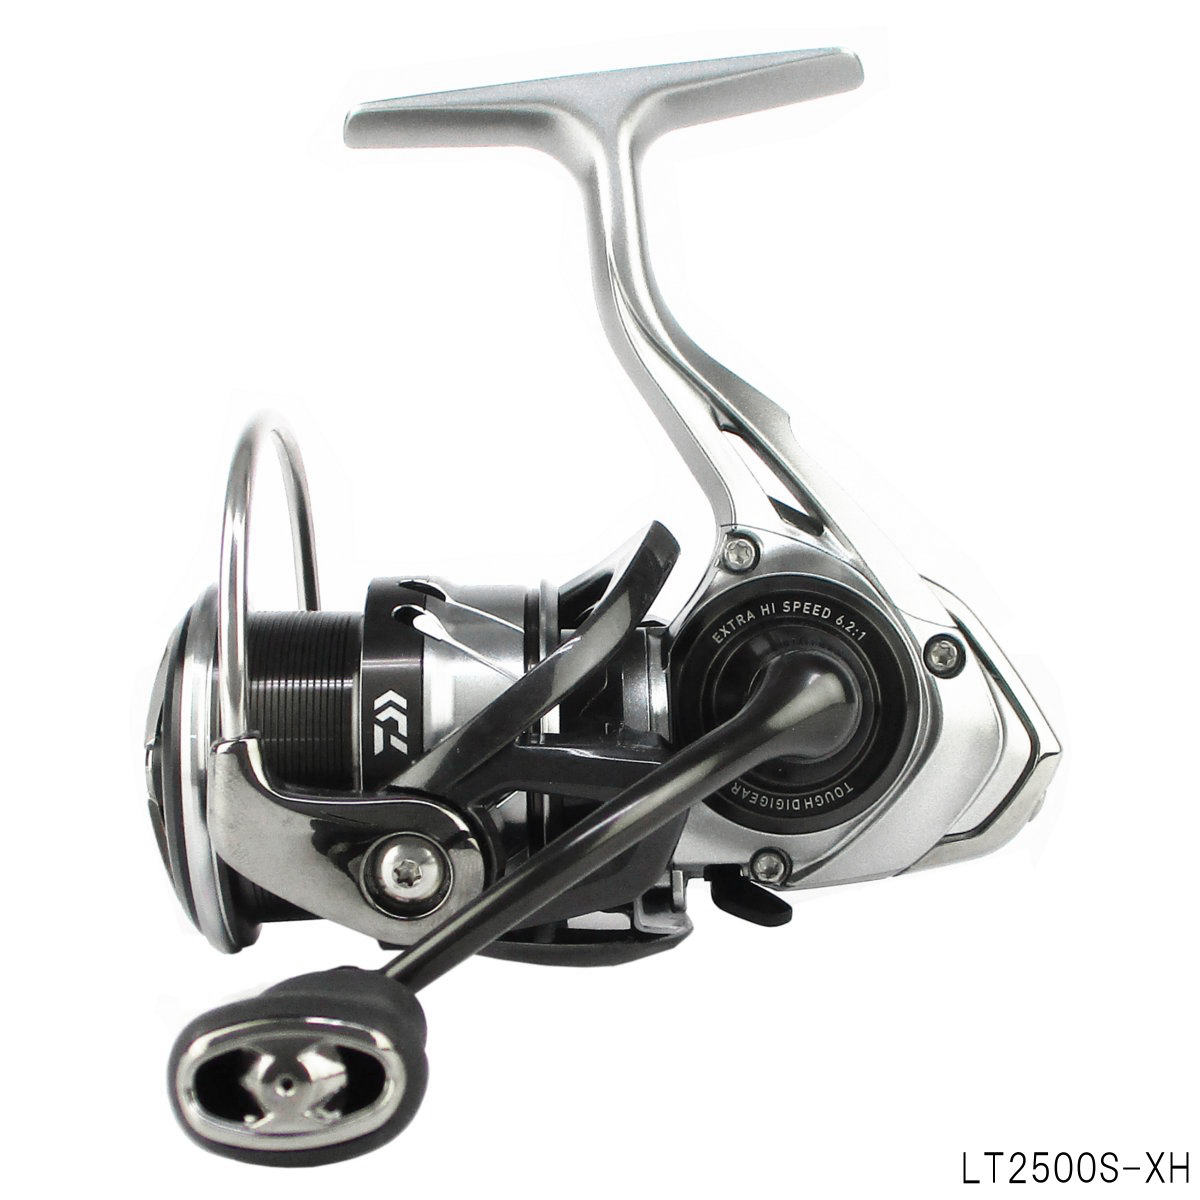 010ebd4cf00 Fishing Tackle Point: Daiwa Cal Deer LT2500S-XH | Rakuten Global Market